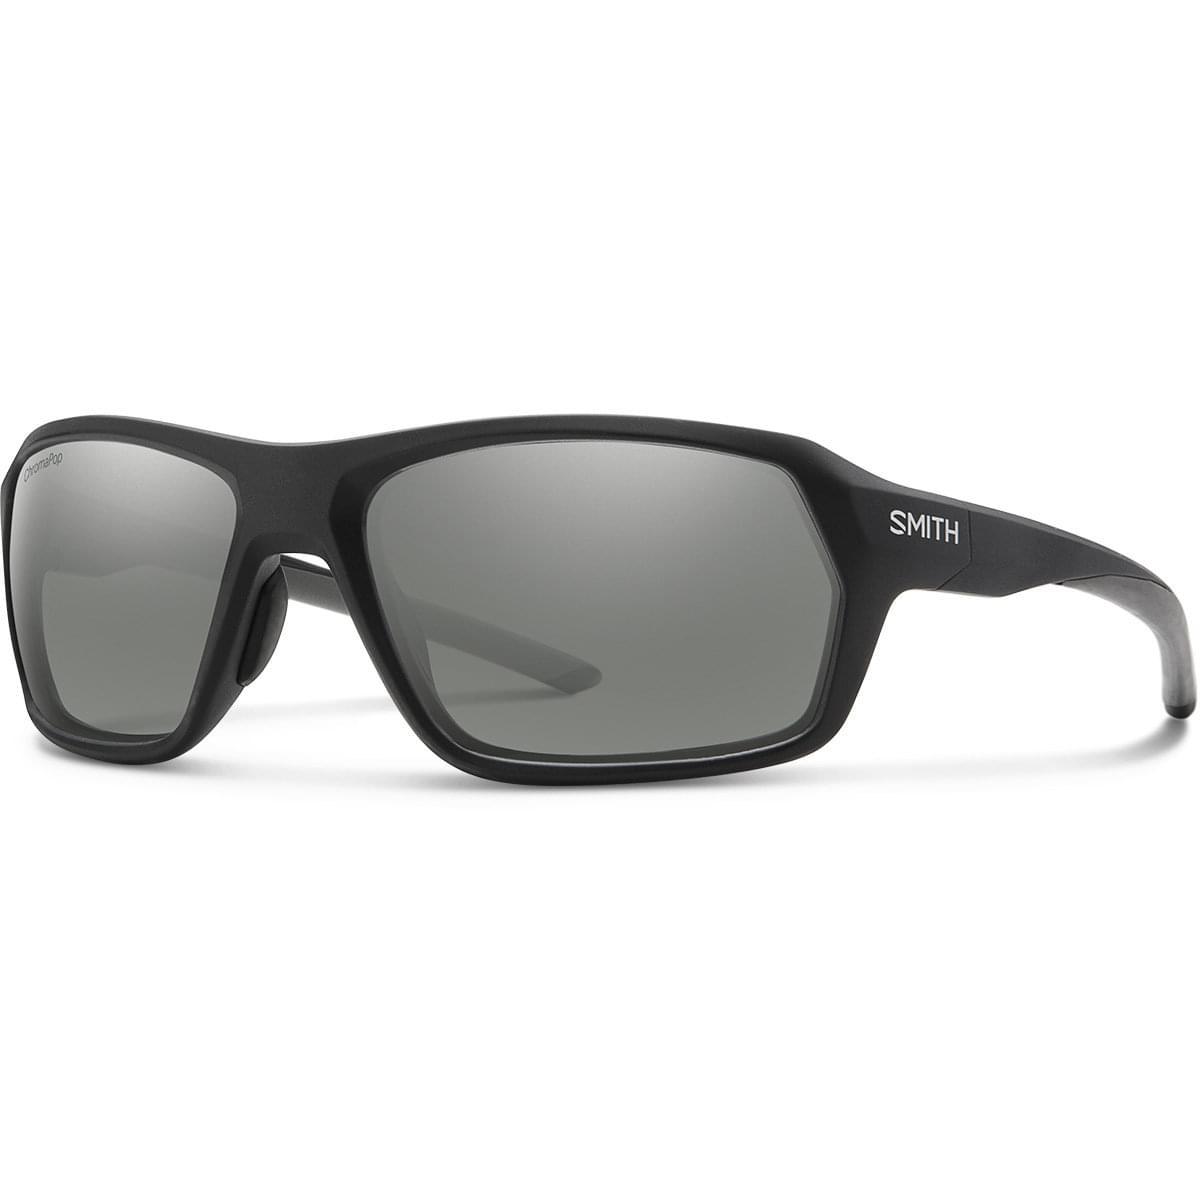 Tifosi Swick Single Lens Sunglasses Crimson/raven/smoke/yellow